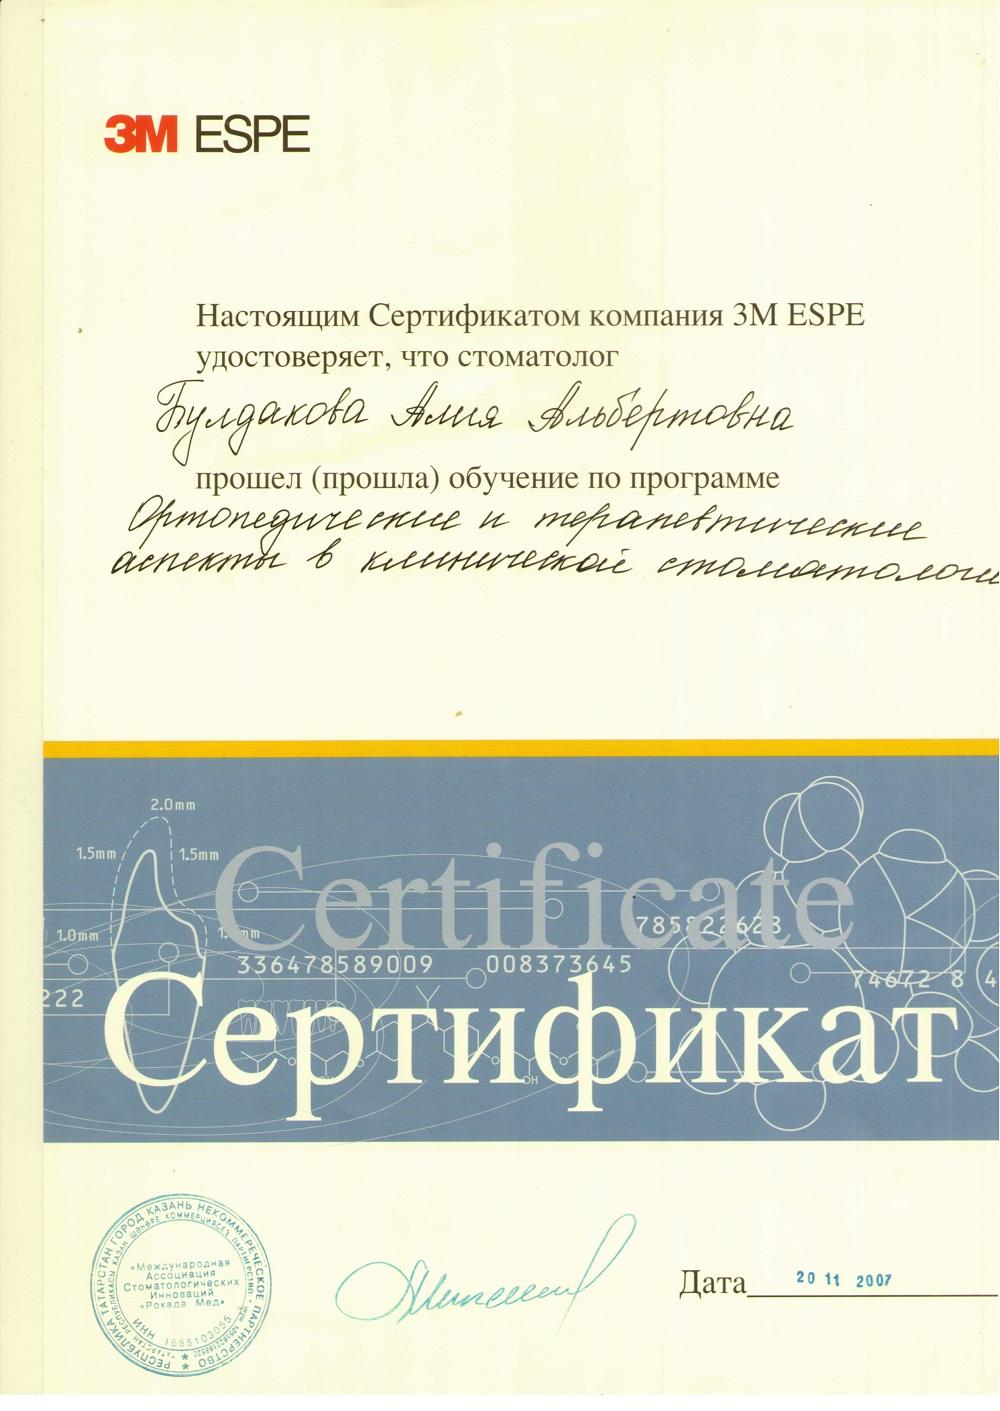 Сертификат 3M ESPE